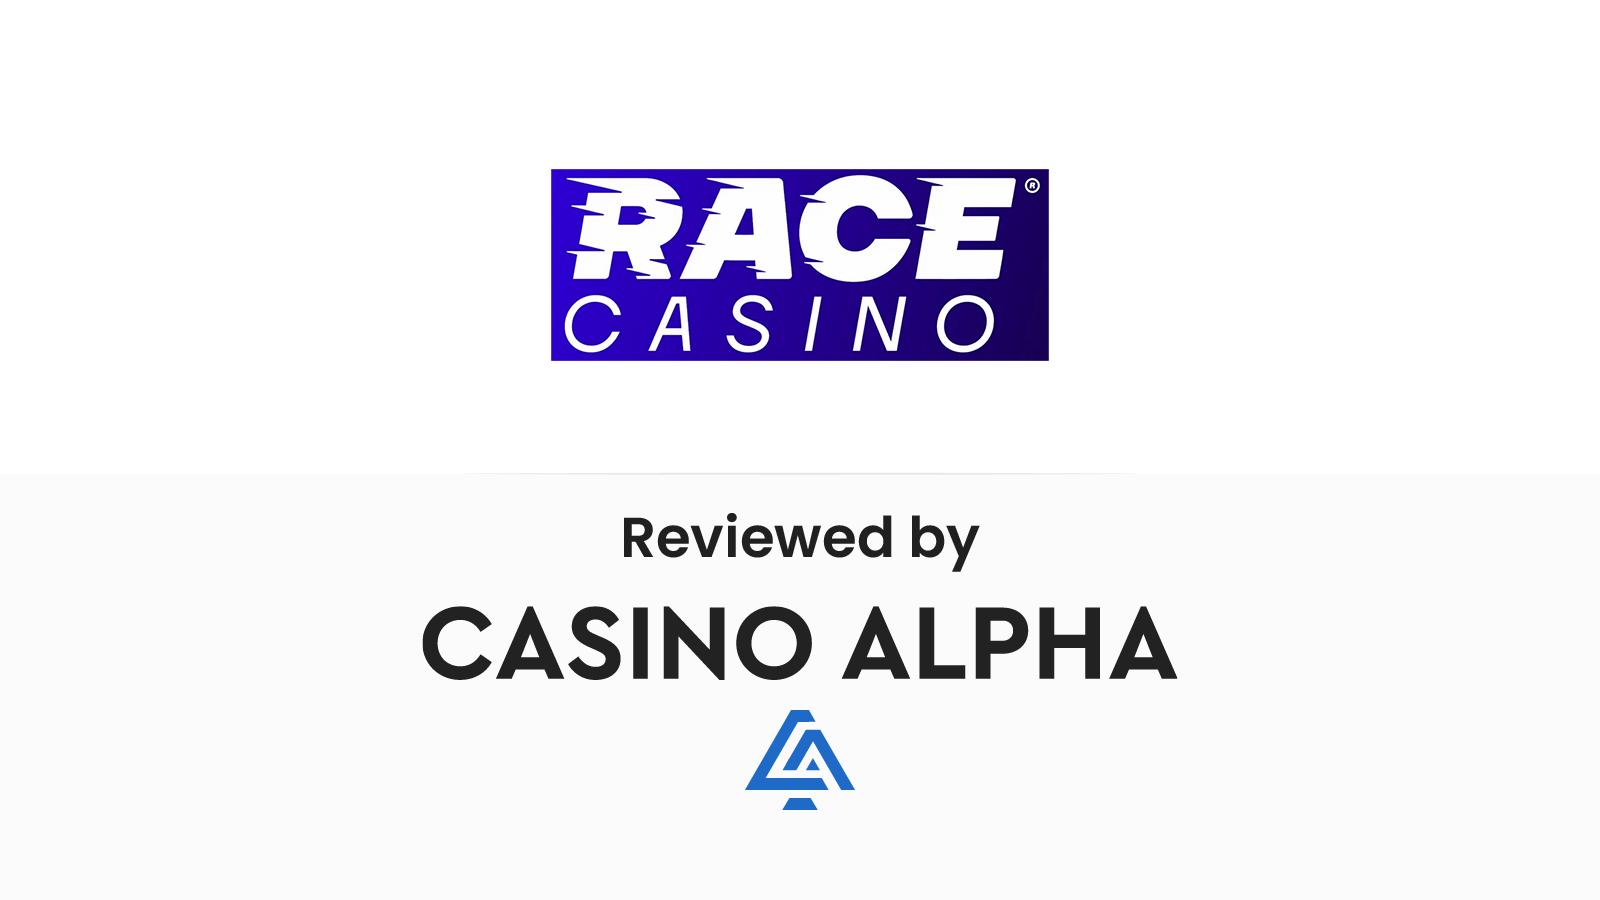 Race Casino Review & Bonuses